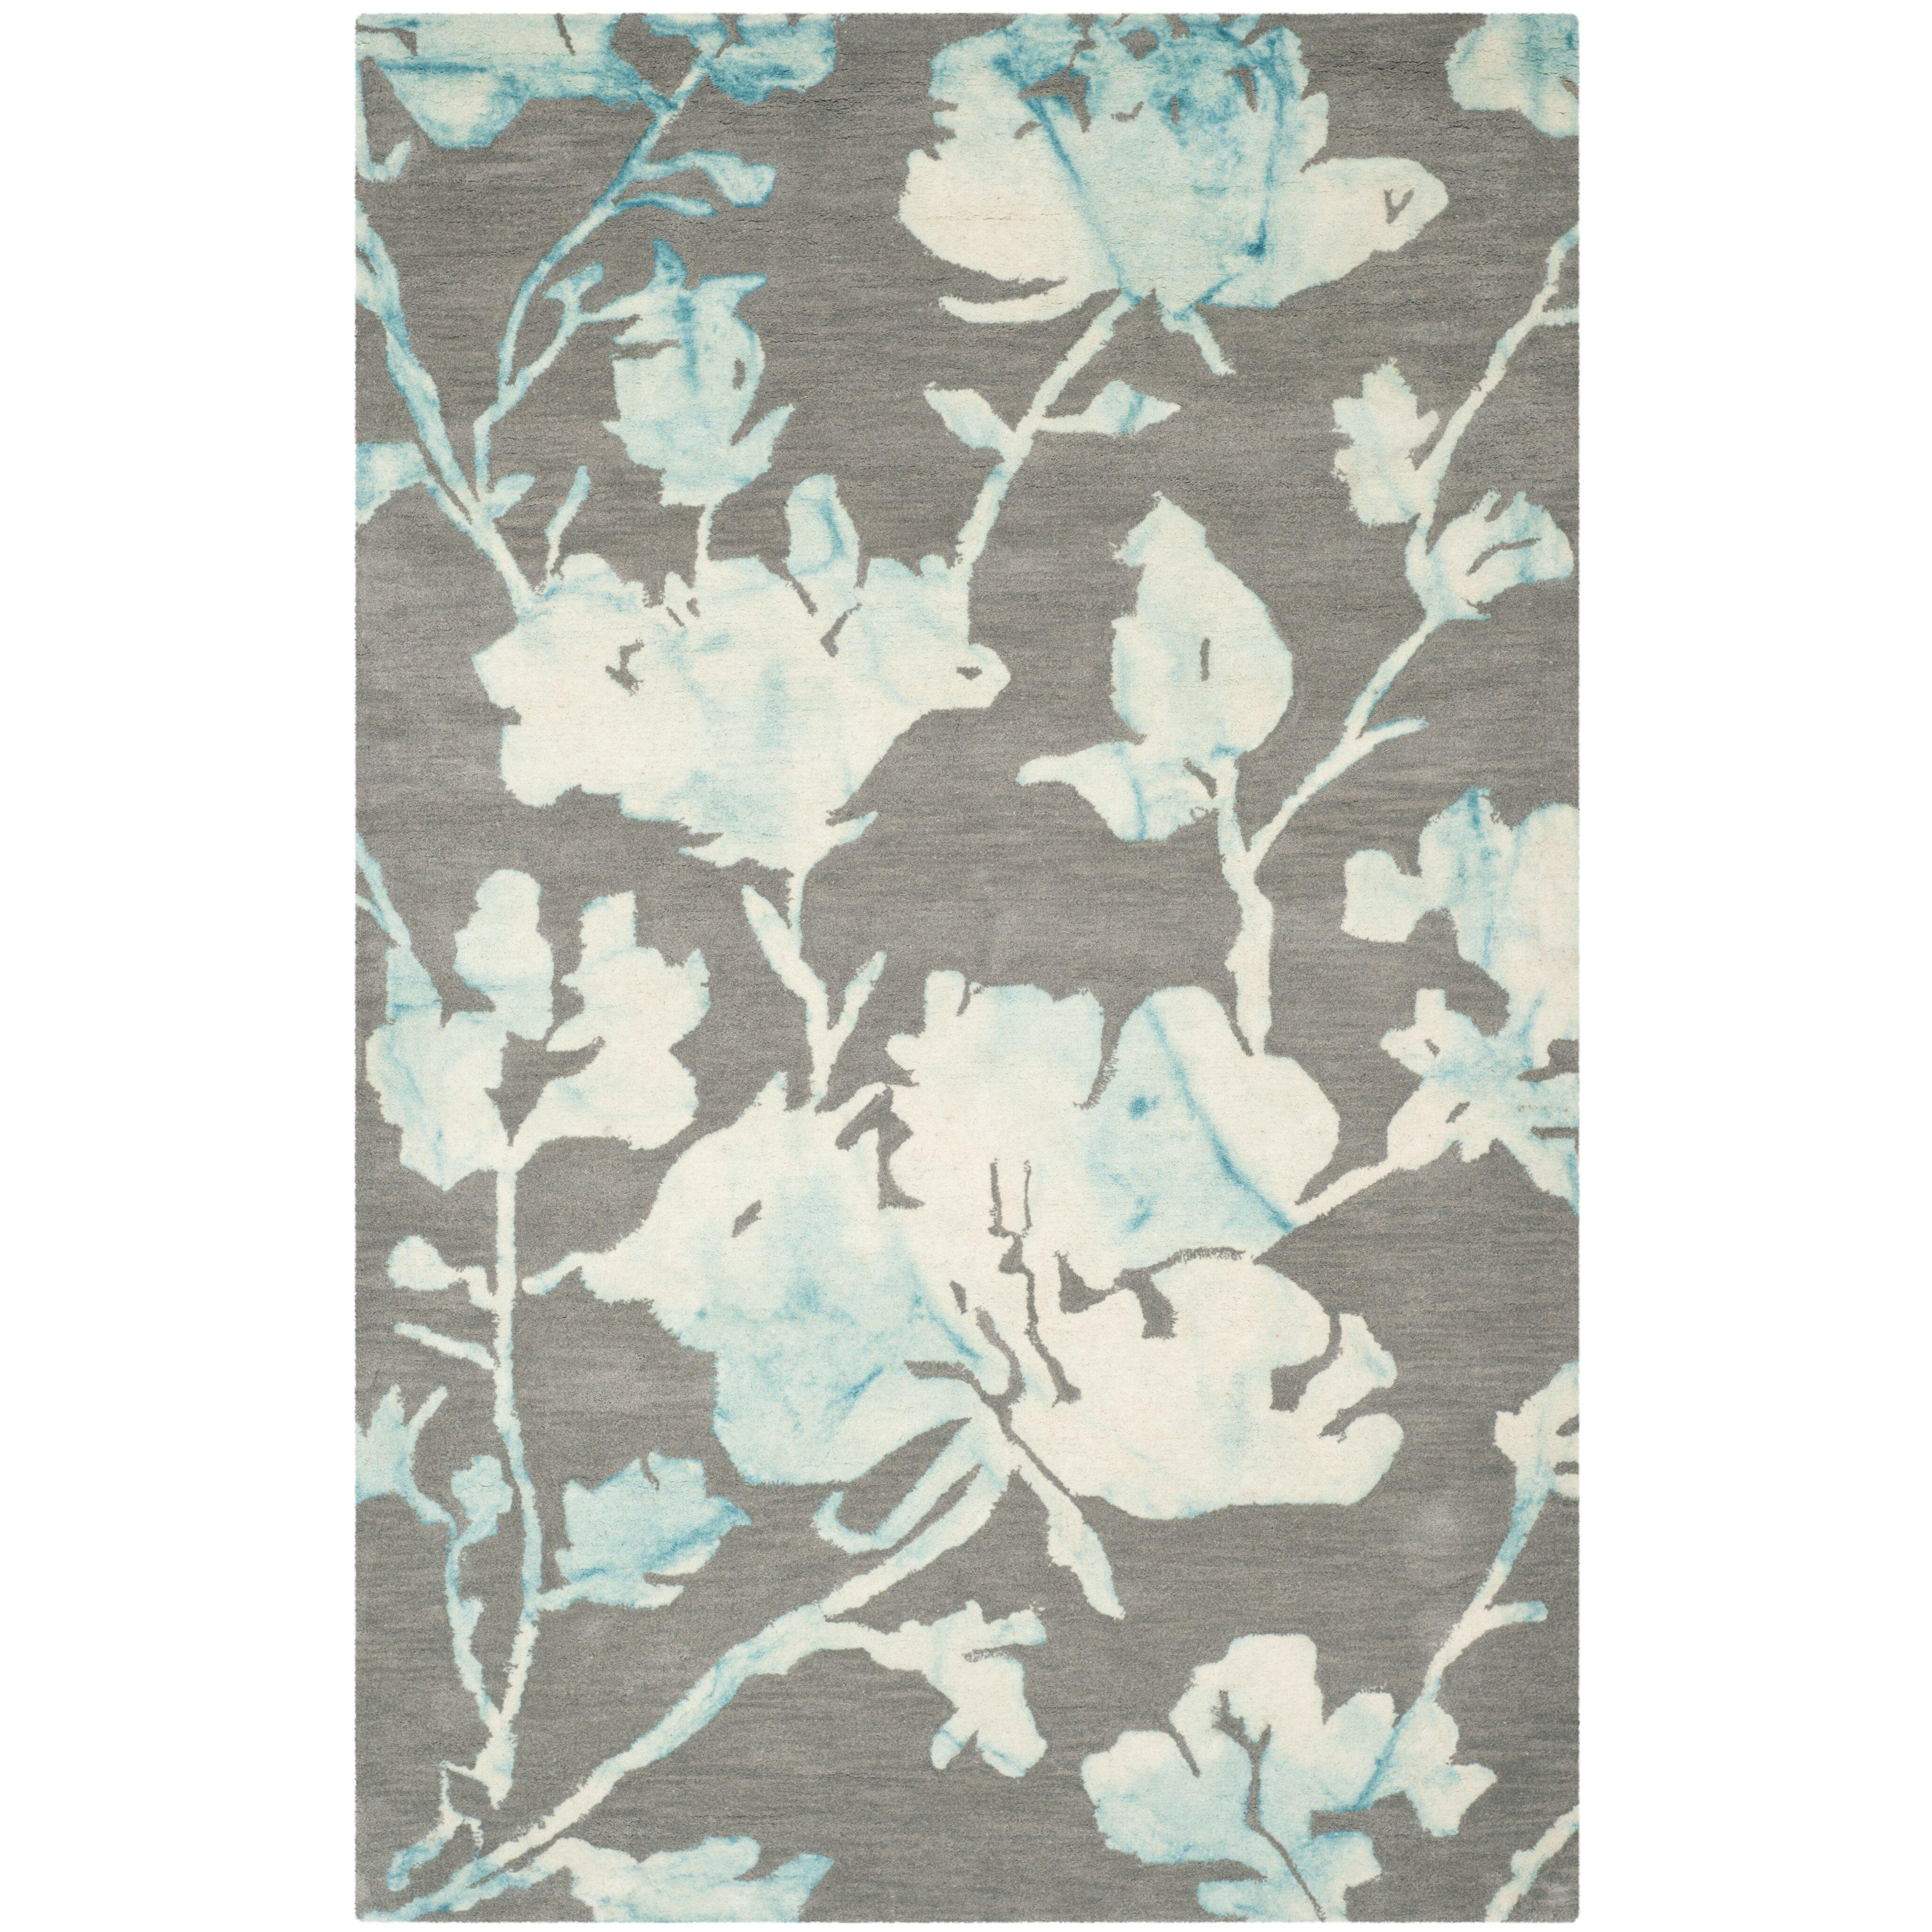 Safavieh Dip Dye Gray Turquoise Area Rug Reviews